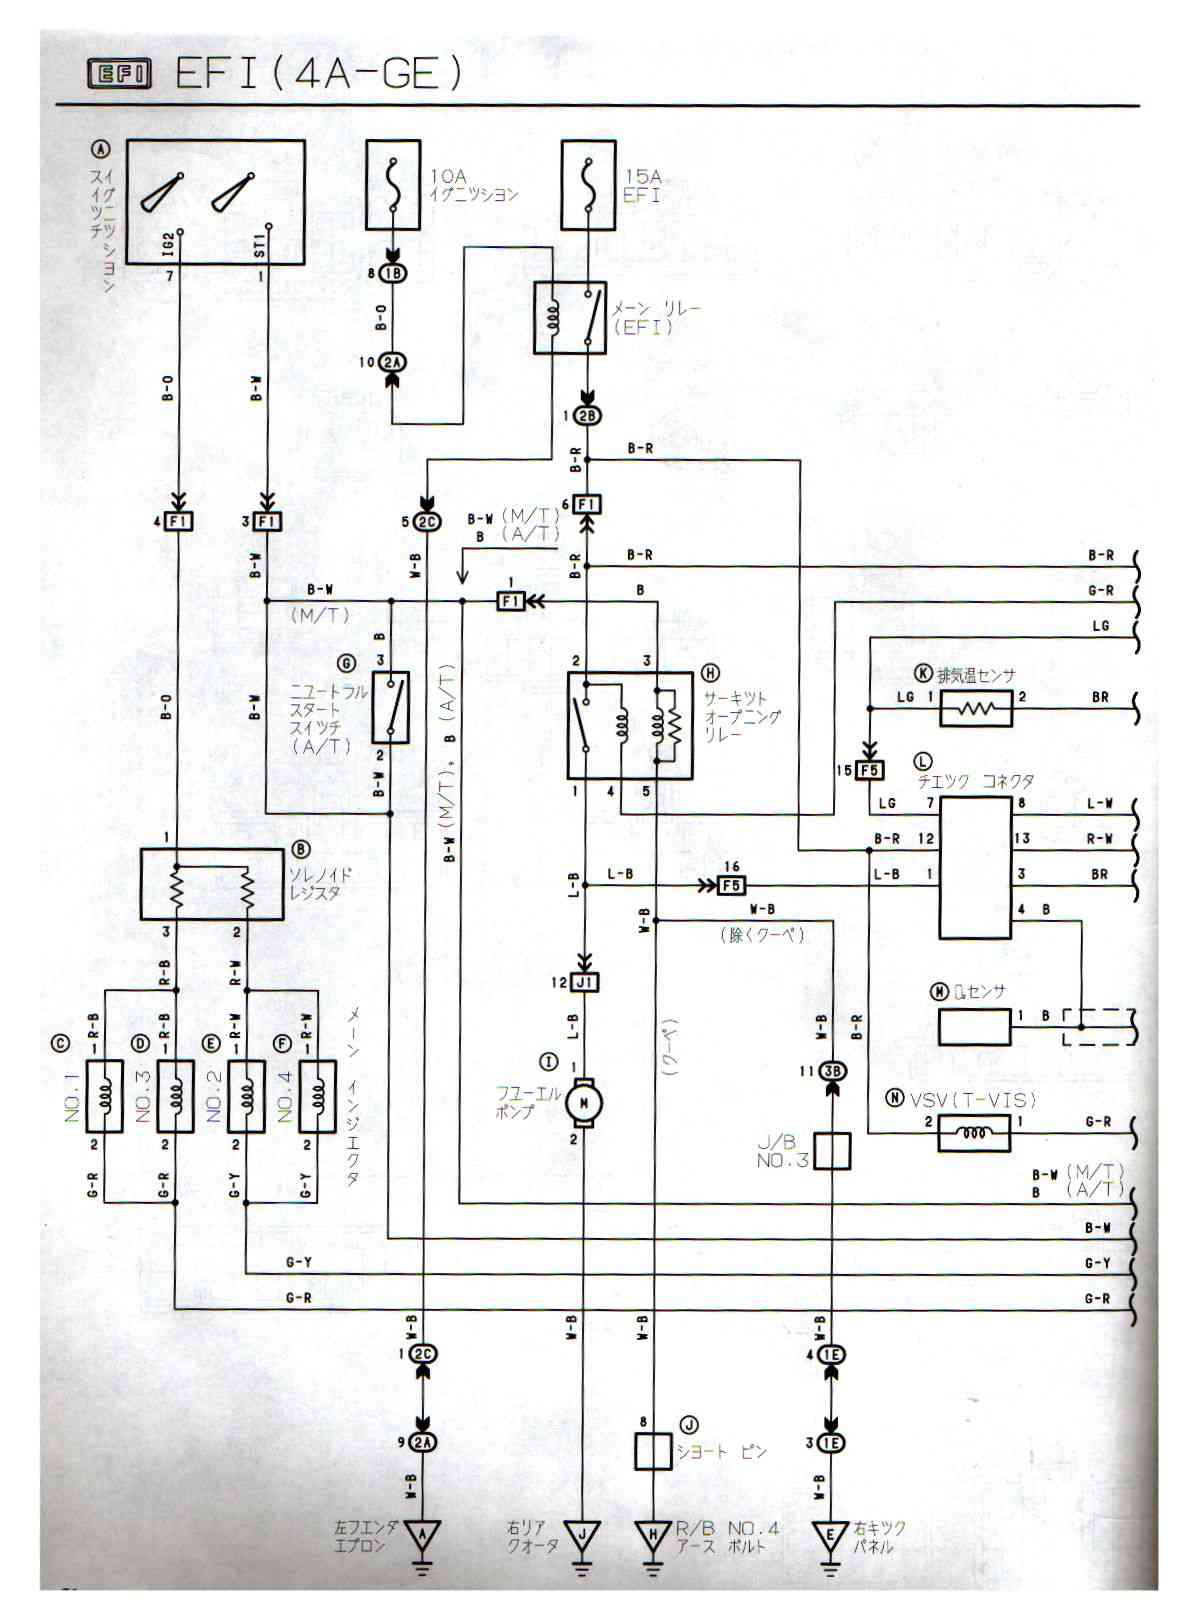 ... toyota 4age wiring diagram wiring diagrams schematics 4age 20v blacktop  wiring diagram toyota 4age 16v wiring